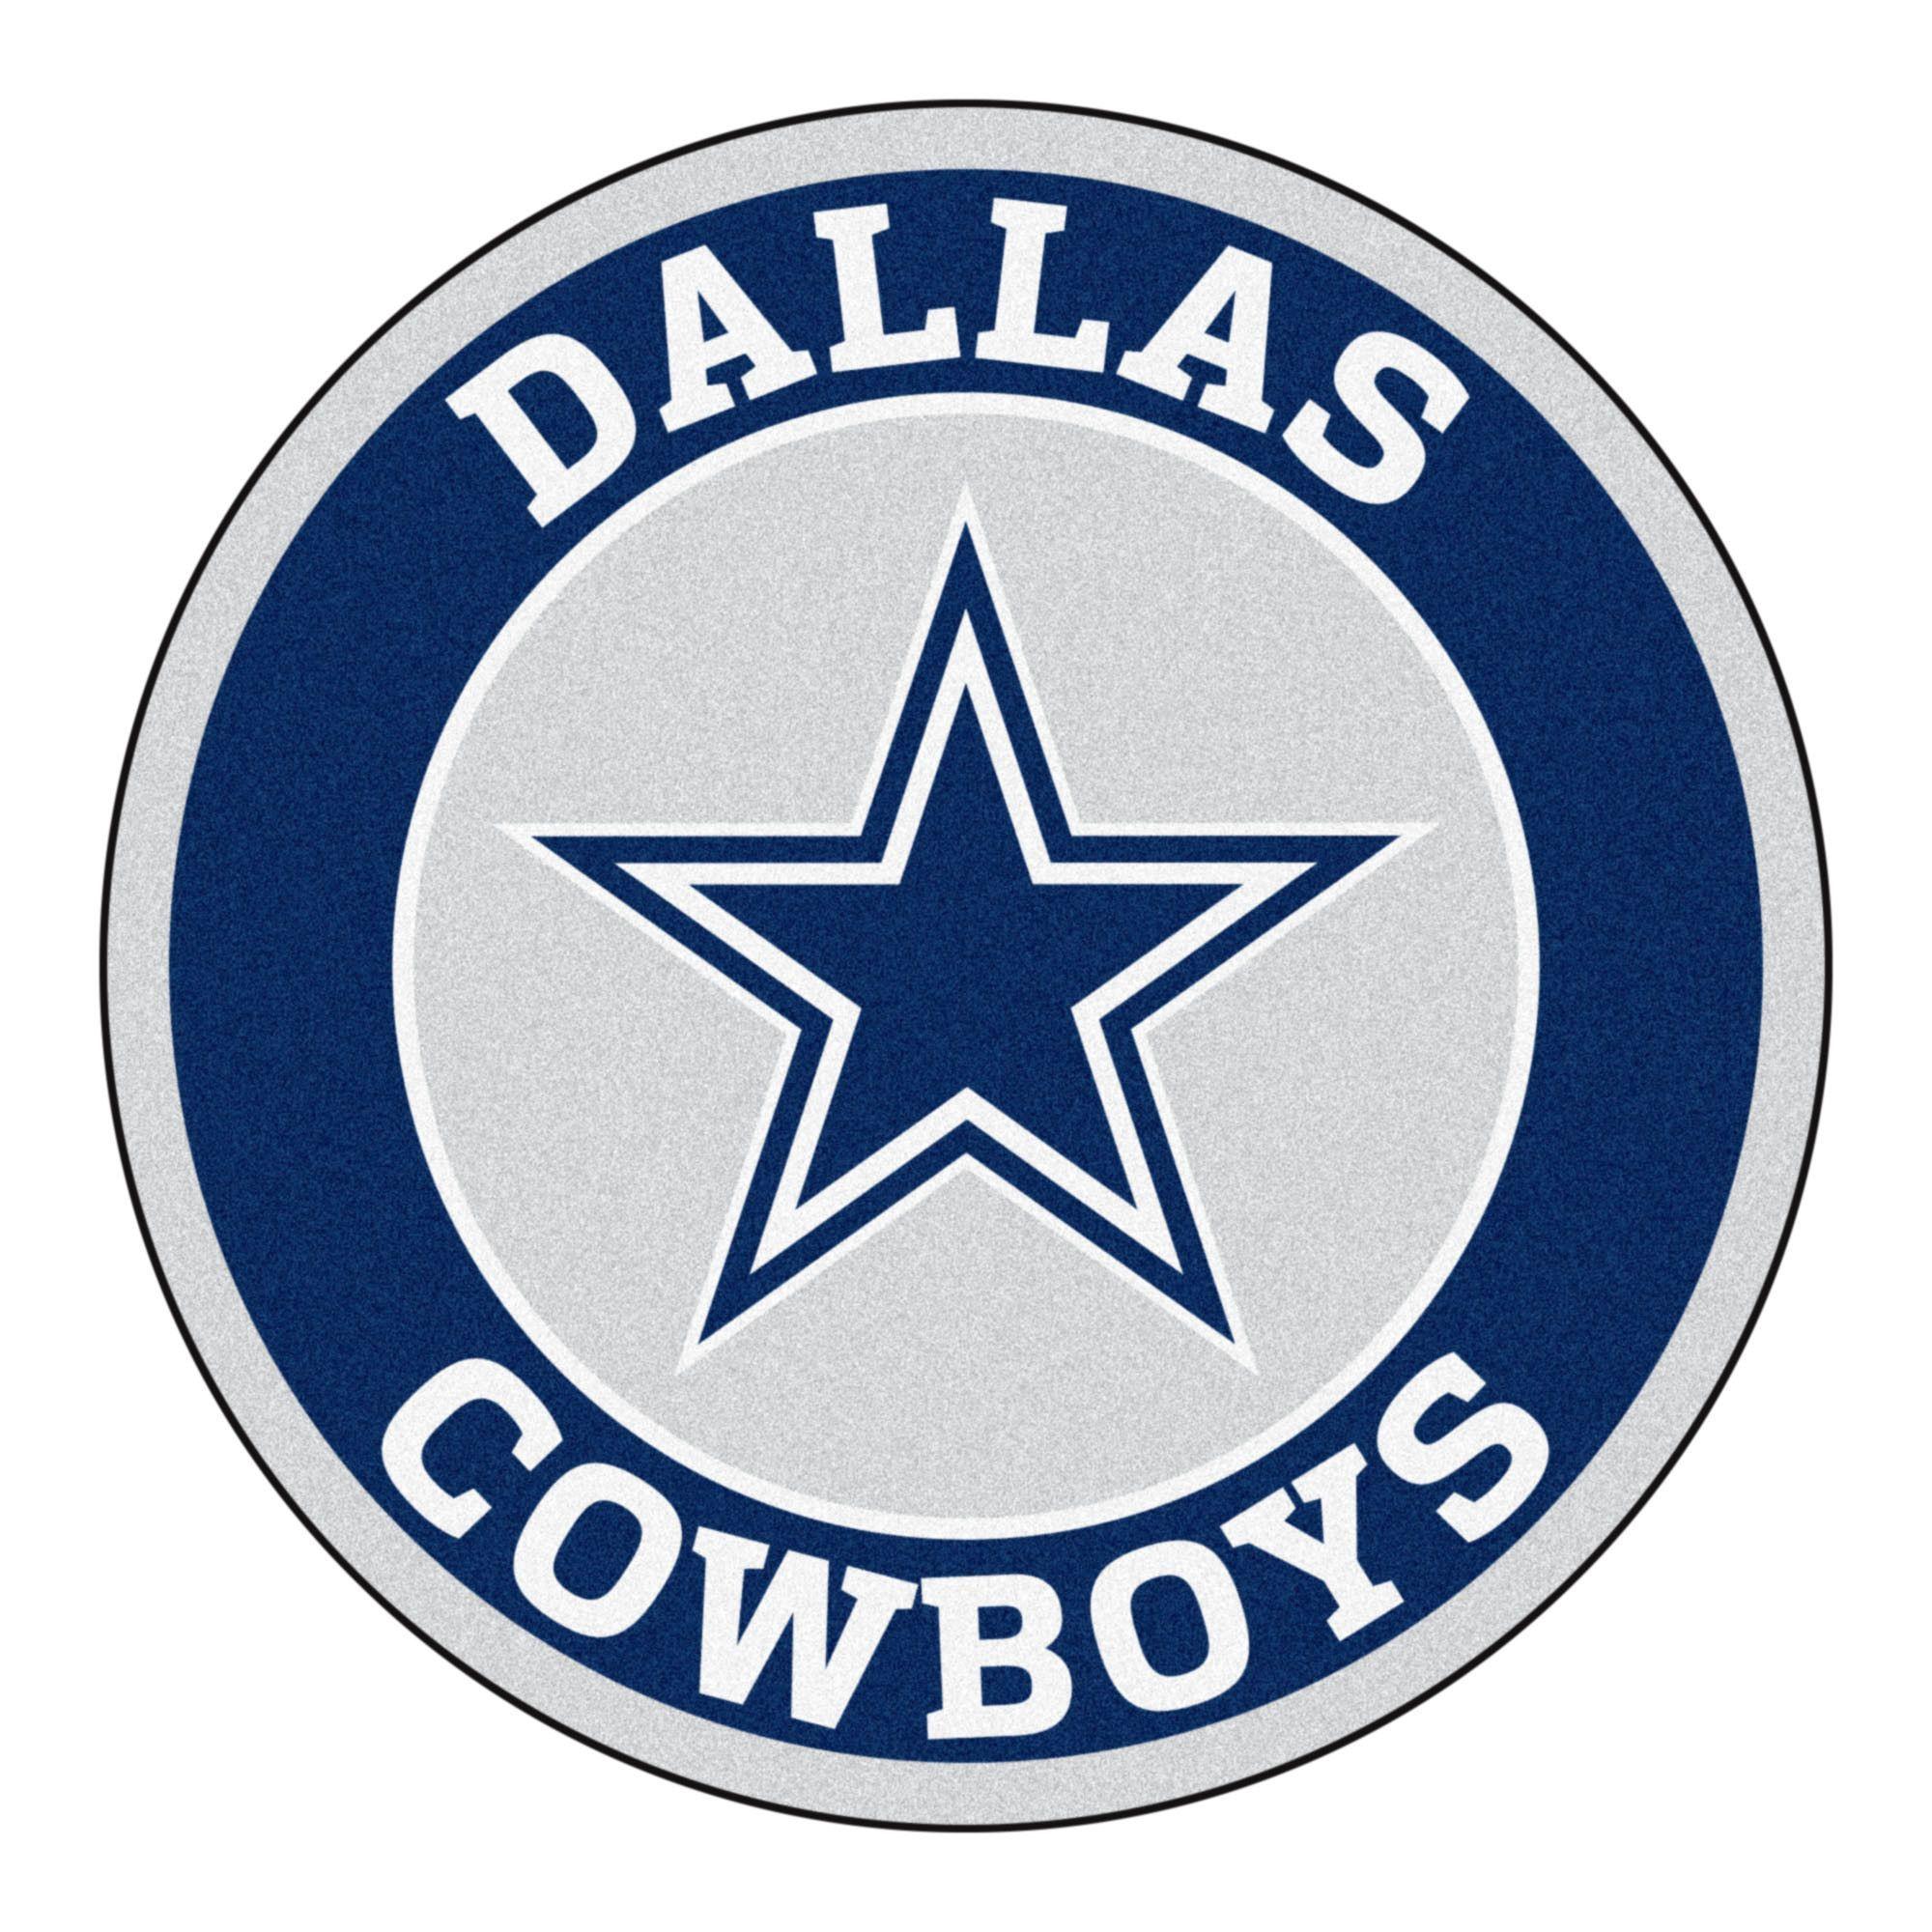 Dallas Cowboys Wall Art dallas cowboys wall art, torched, metal wall art, metal art 24